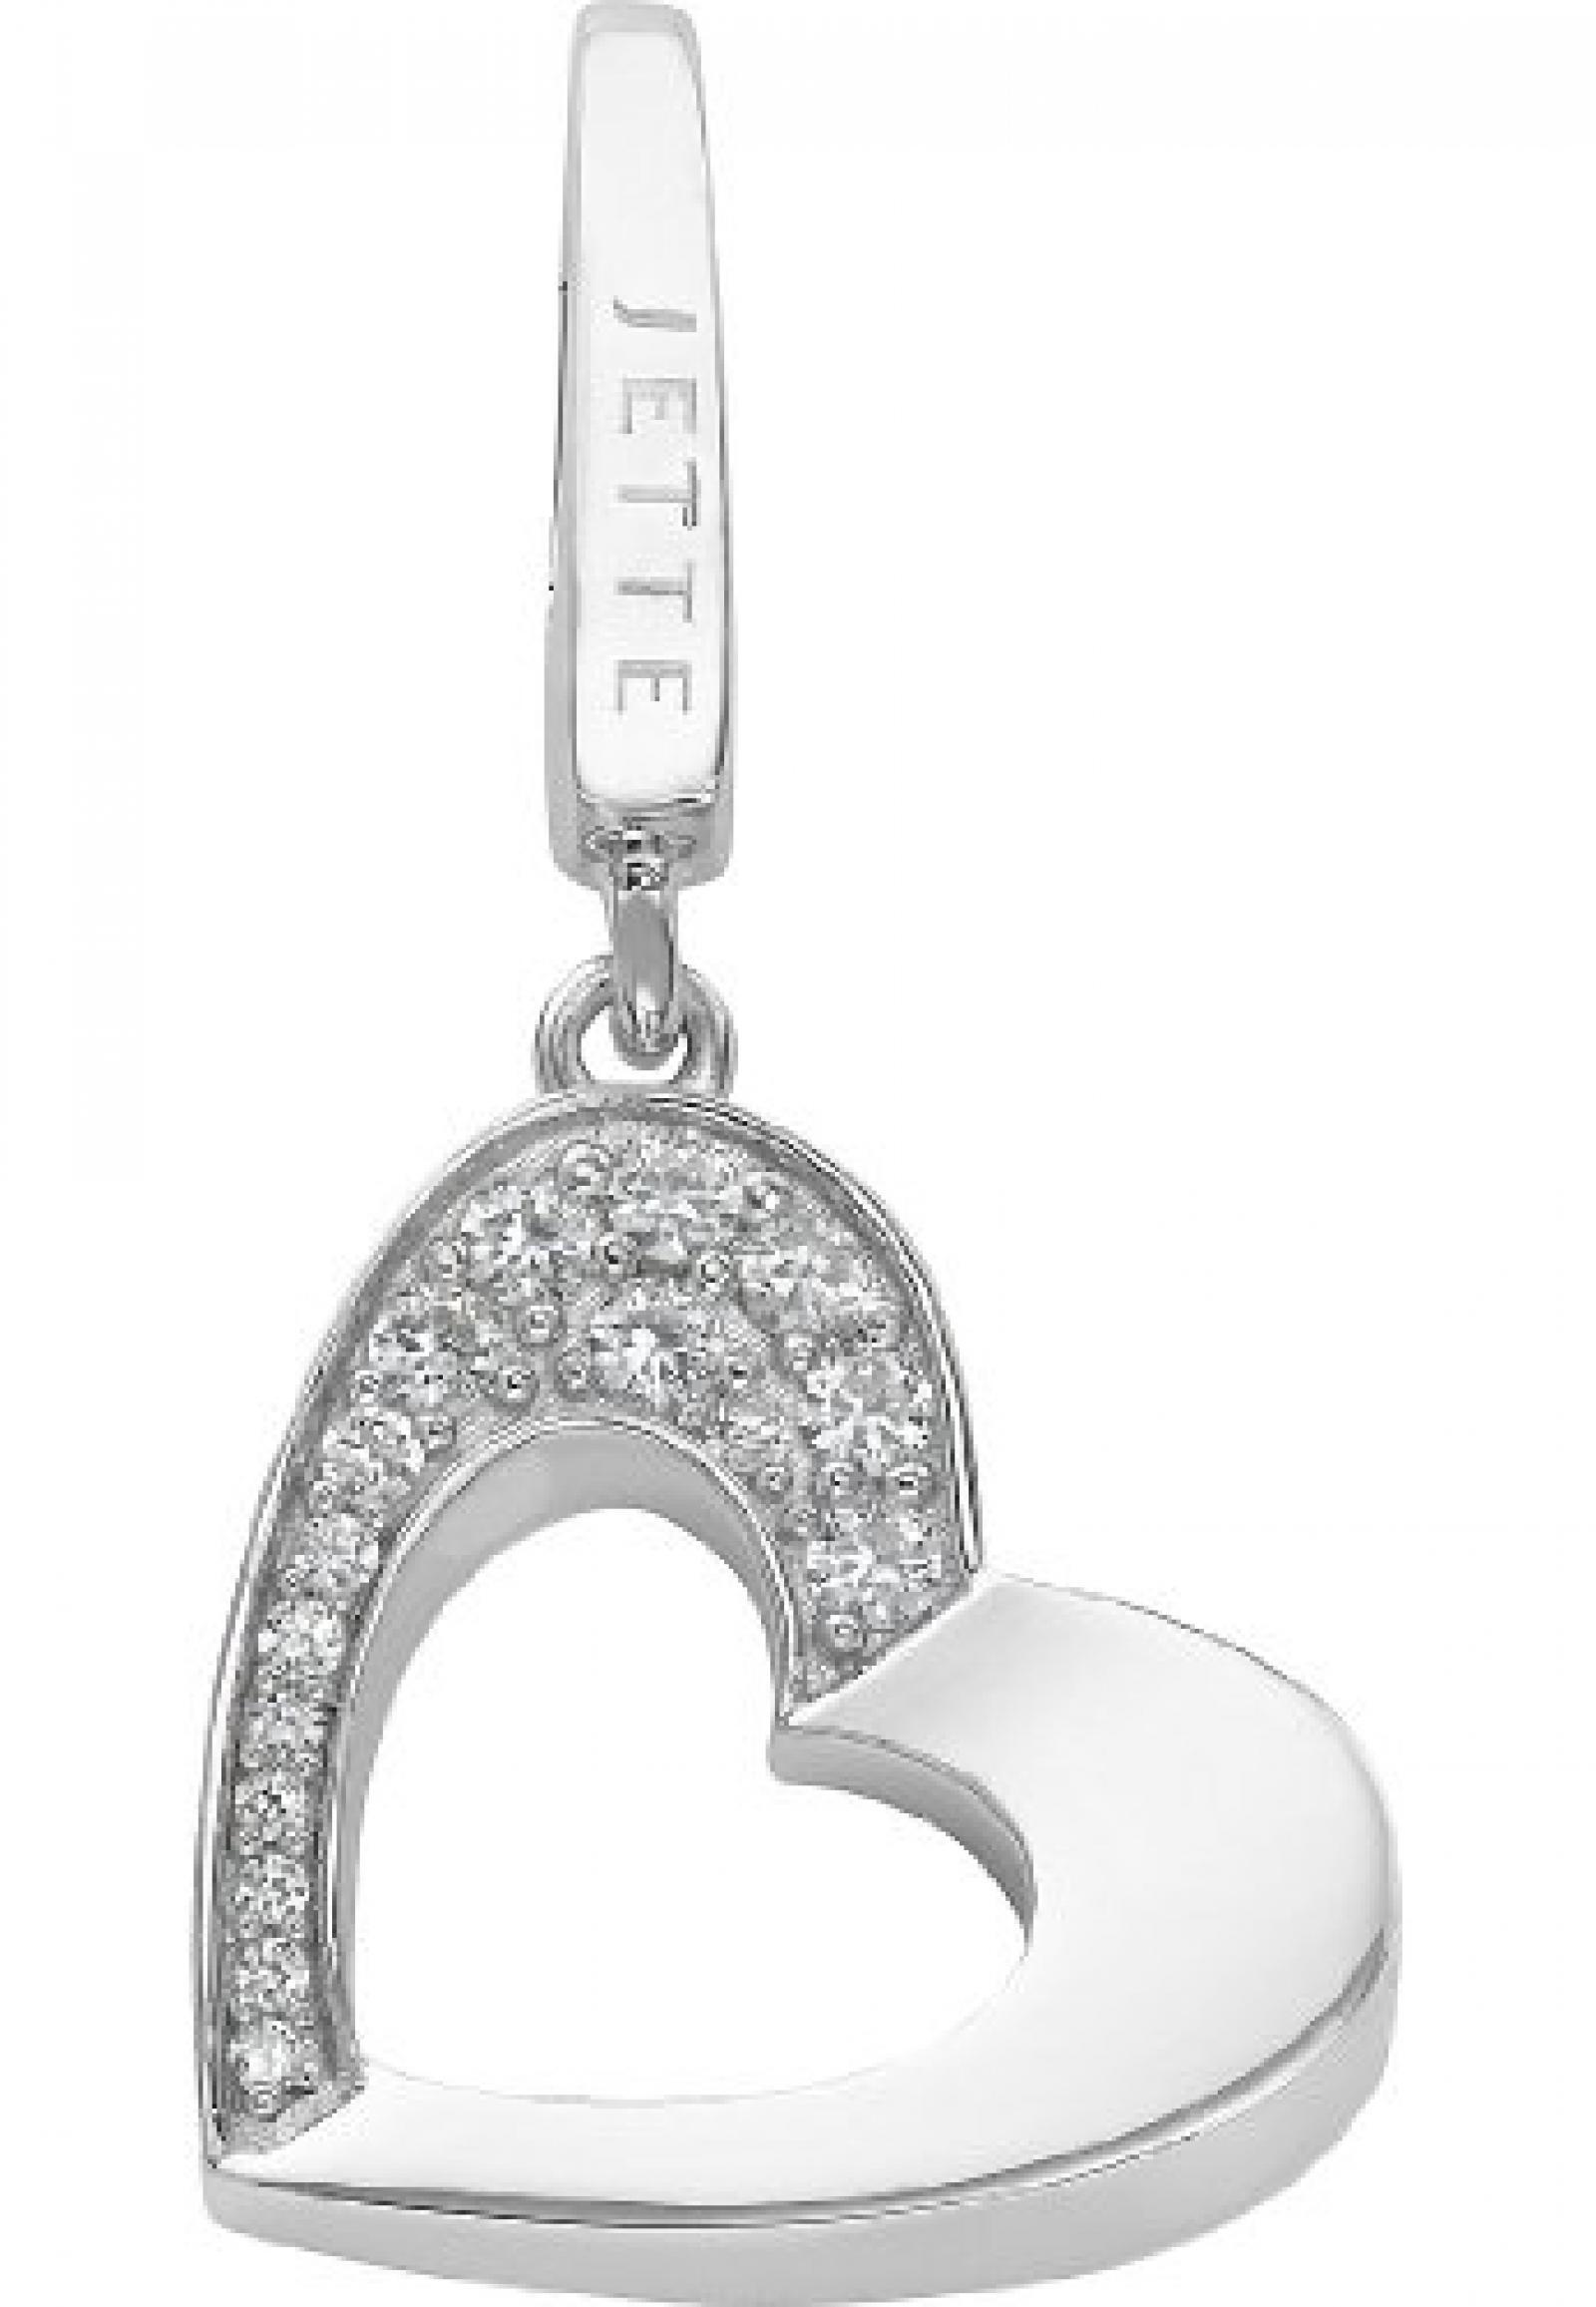 JETTE Charms Damen-Charm CHARM 925er Silber rhodiniert 16 Zirkonia One Size, silber